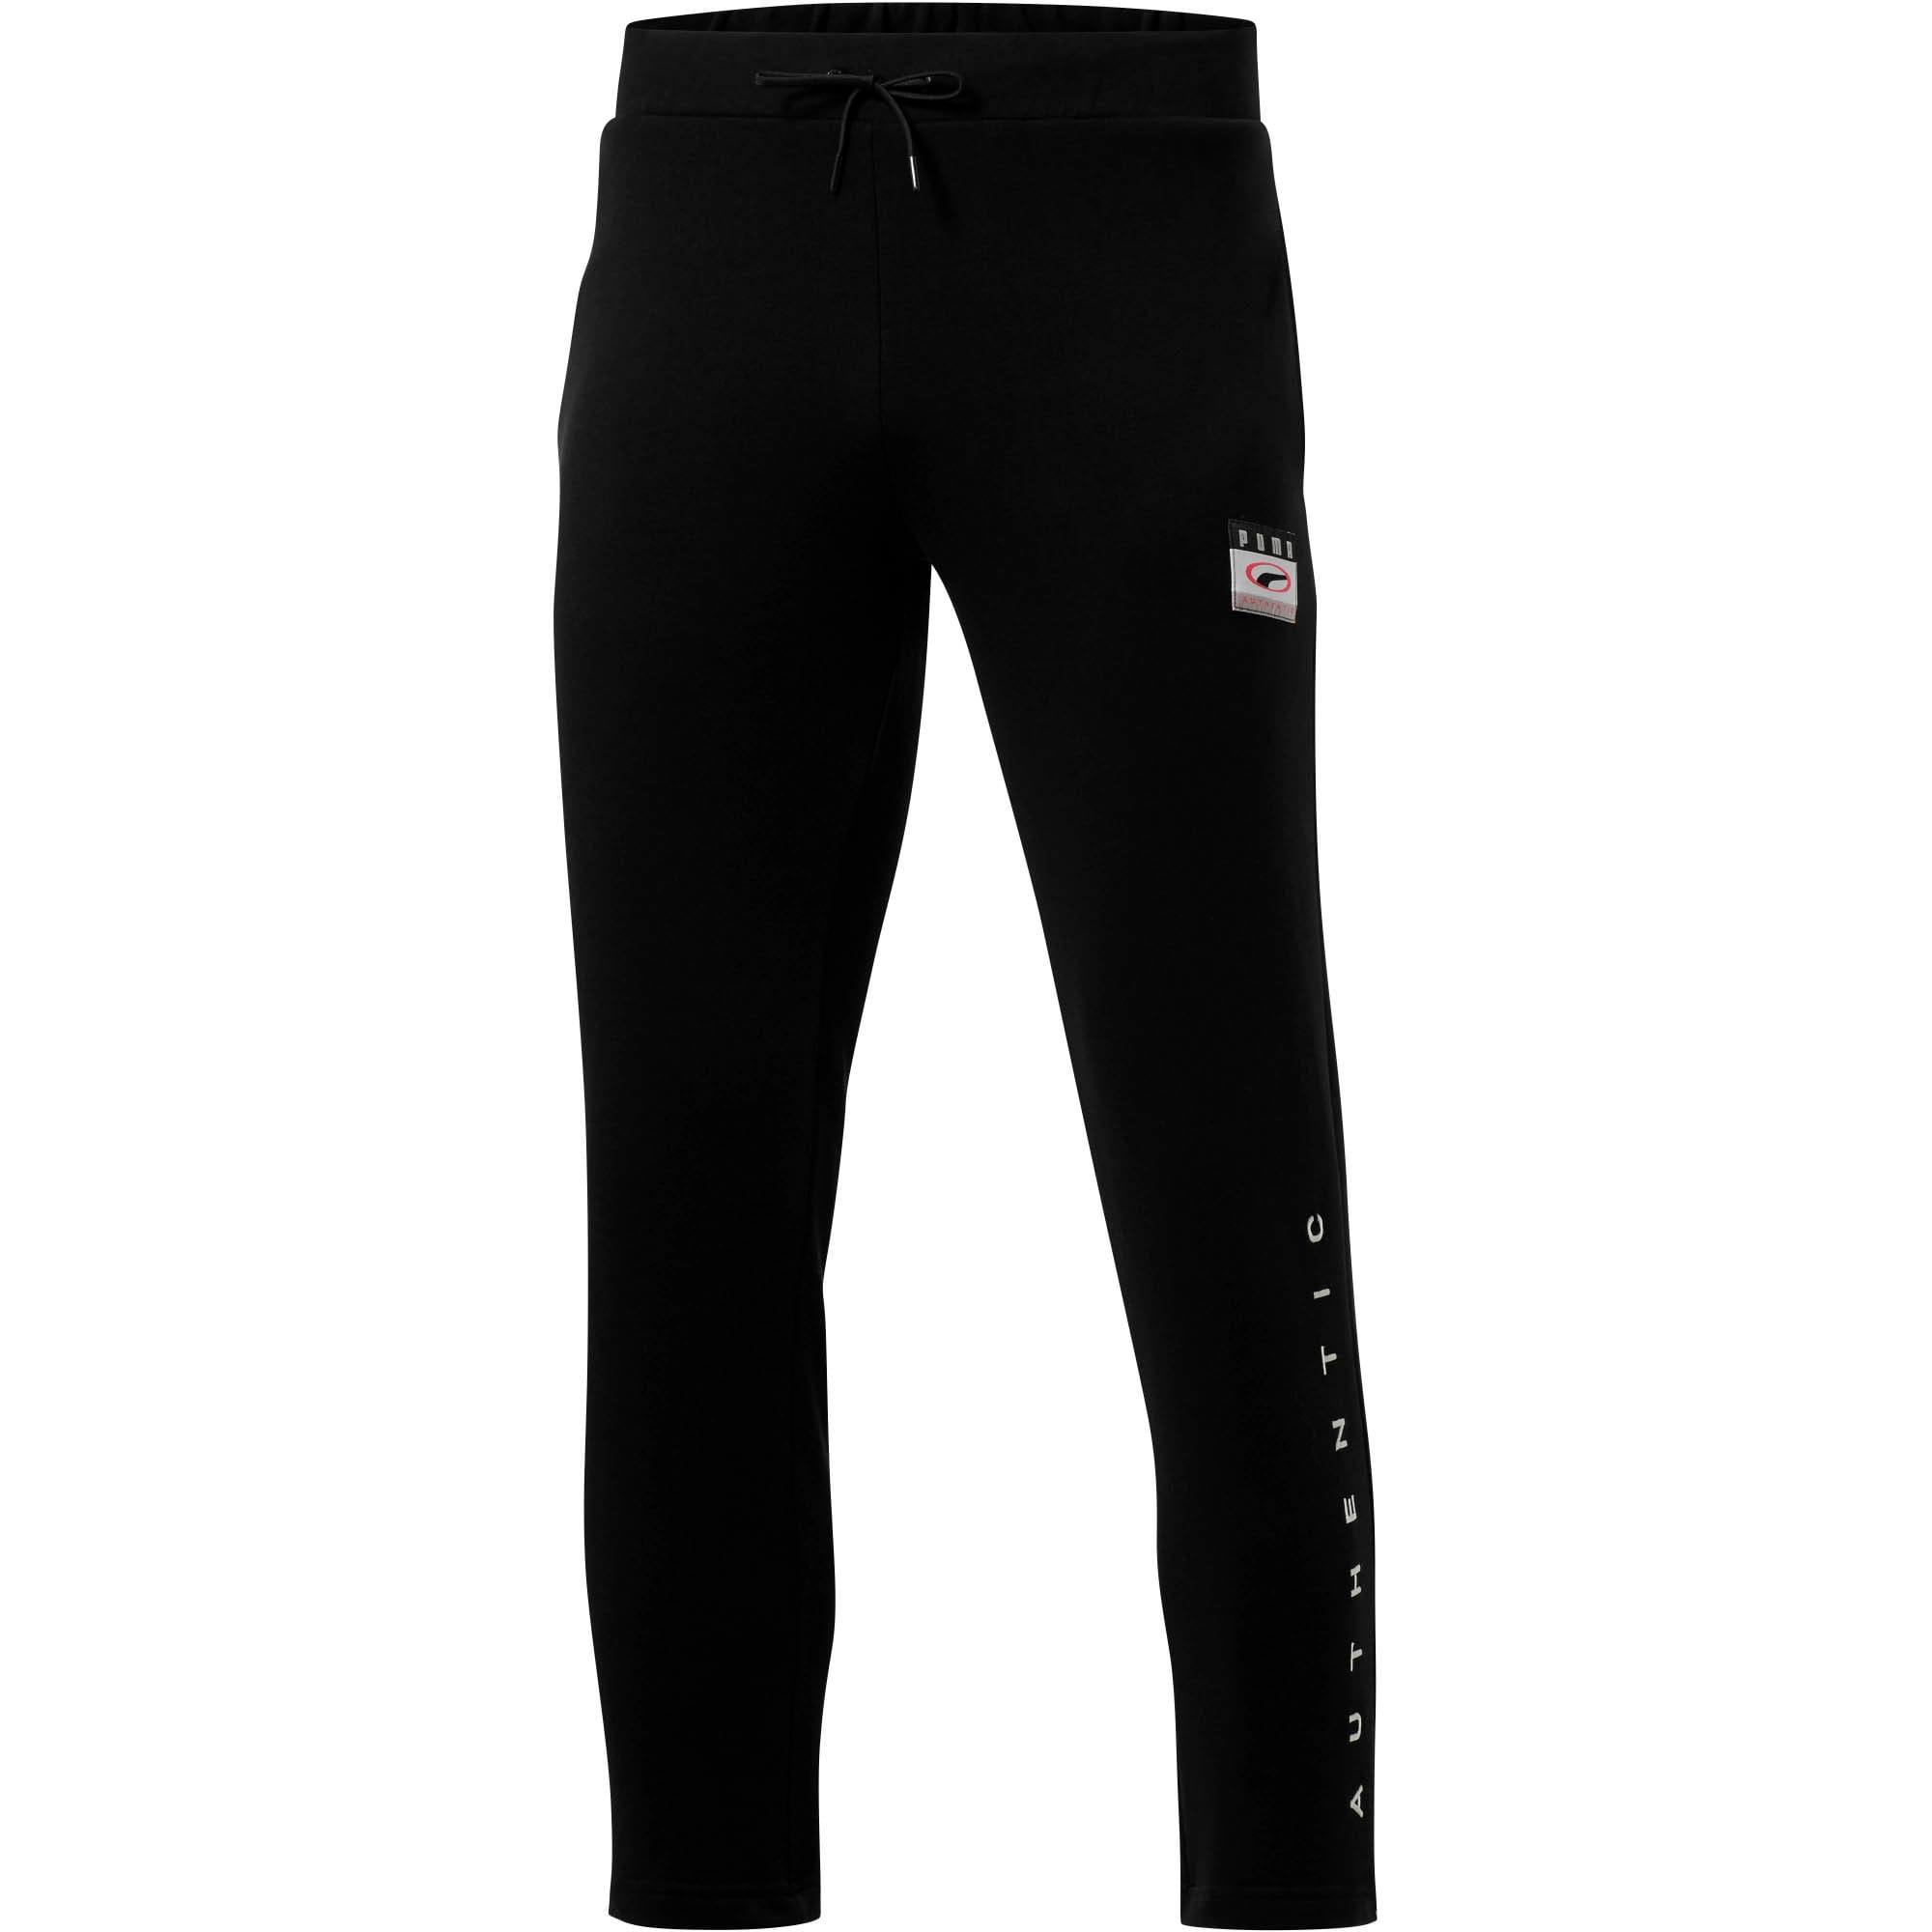 Thumbnail 2 of '90s Retro Men's Sweatpants, Cotton Black, medium